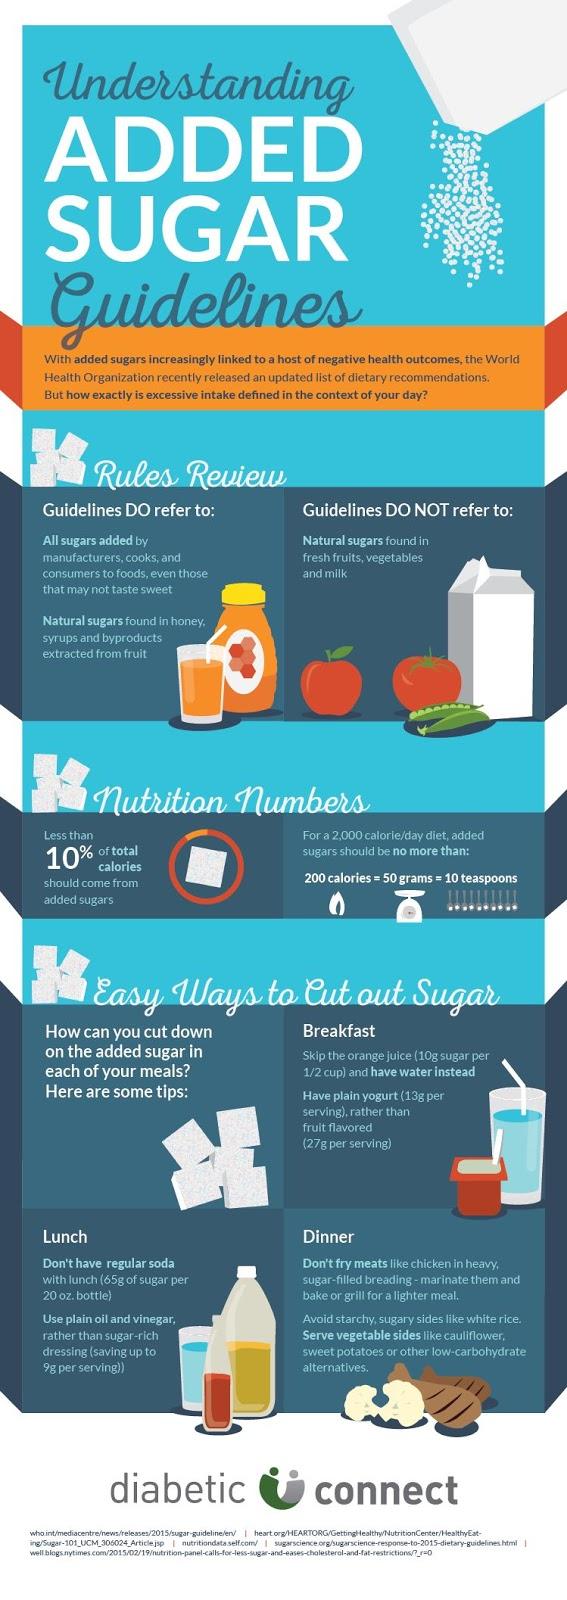 Skinny Diva Diet: Understanding Added Sugar Guidelines [Infographic]